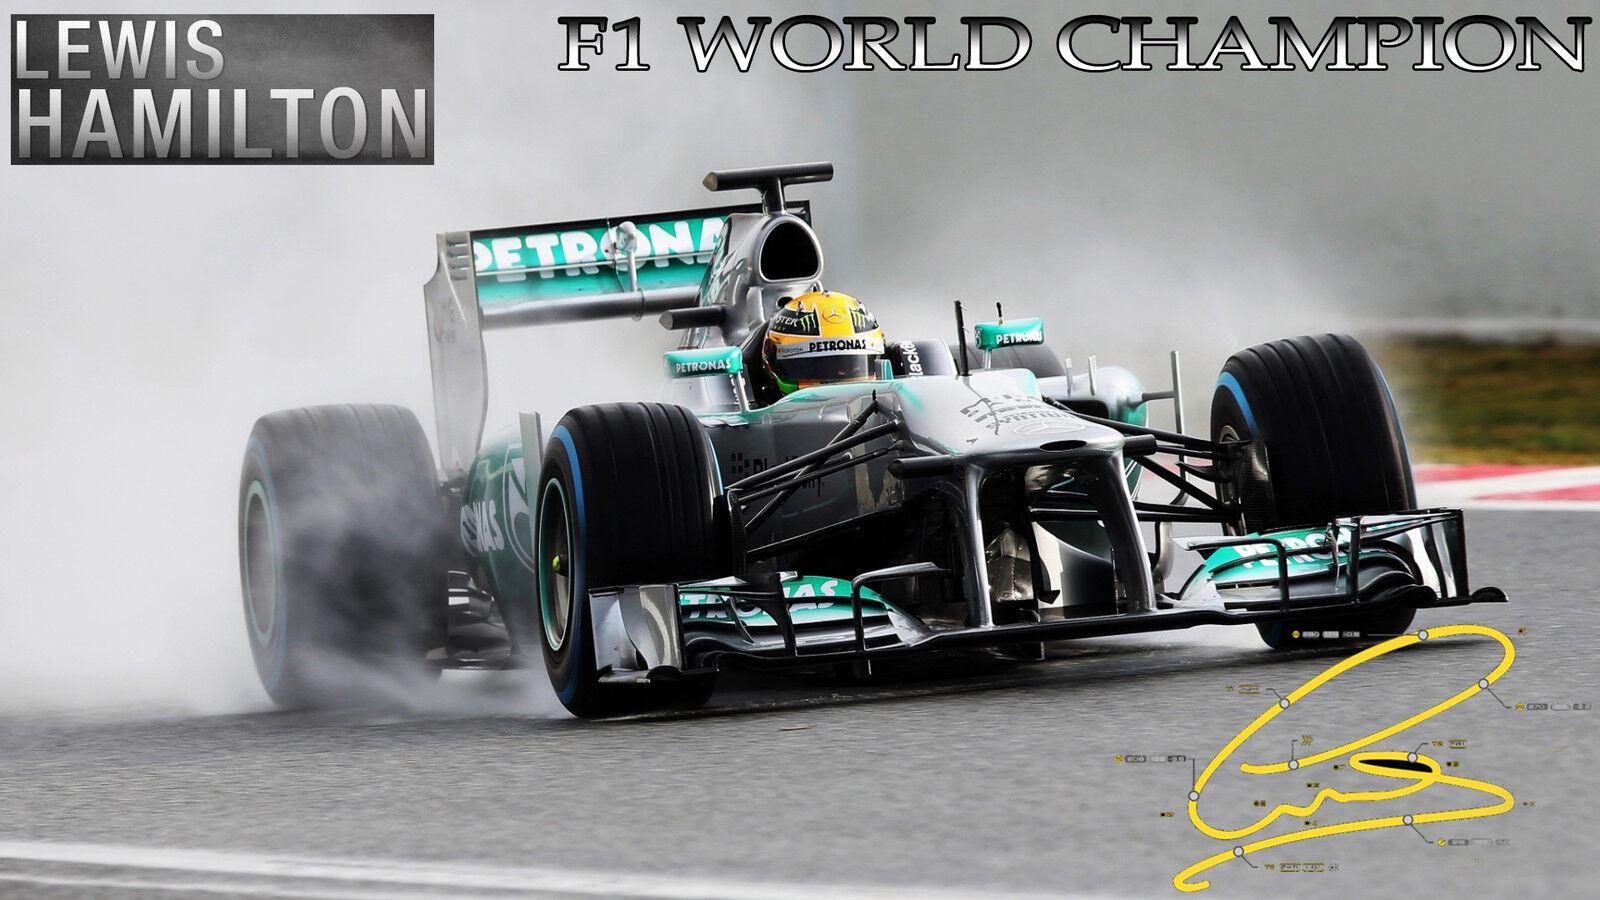 Lewis Hamilton Formula 1 F1 44 Motor T-shirt Baseball Vest Men Women Unisex 2680